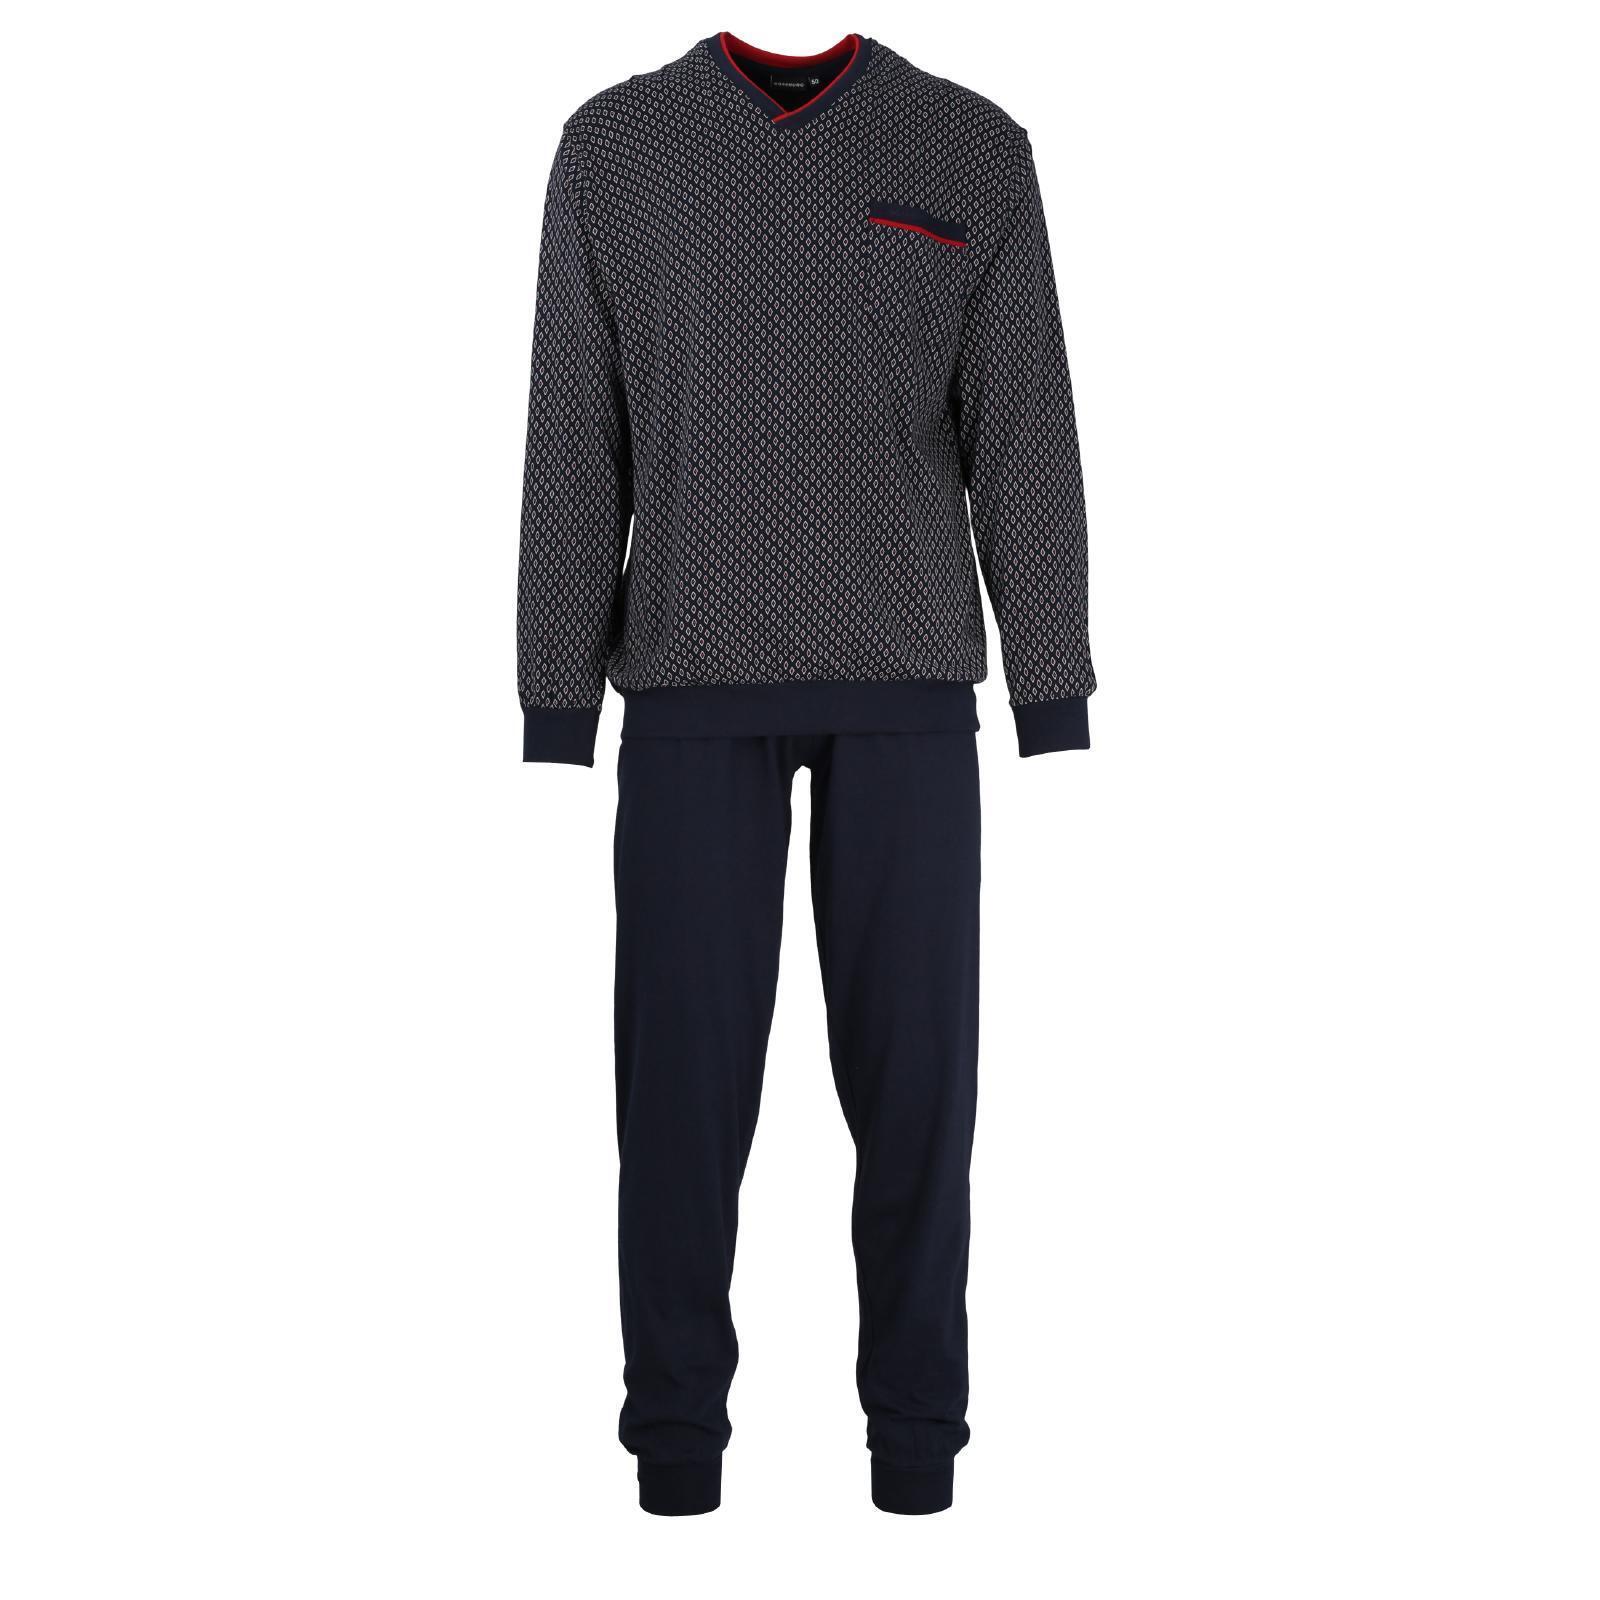 Götzburg Pyjama Schlafanzug lang  Gr. 48  navy  Bündchen Baumwolle V-Ausschnitt